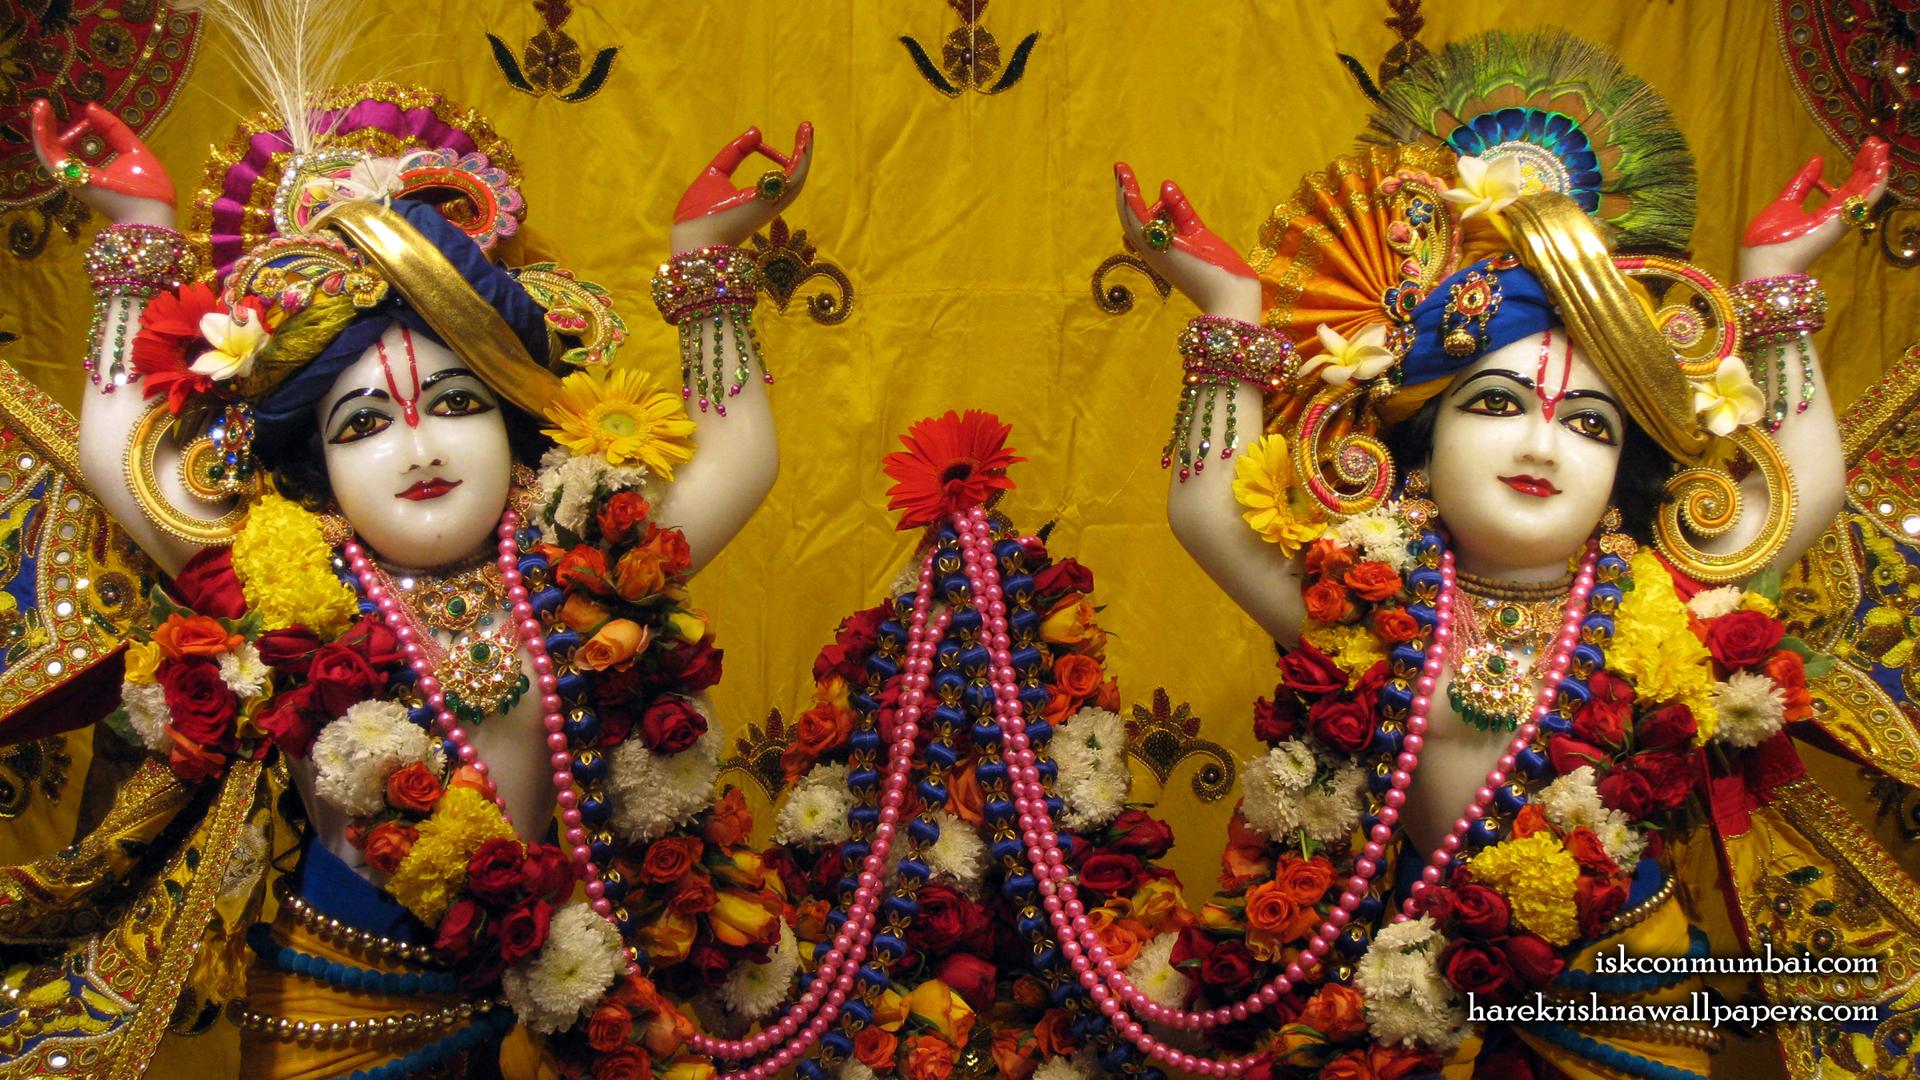 Sri Sri Gaura Nitai Close up Wallpaper (009) Size 1920x1080 Download